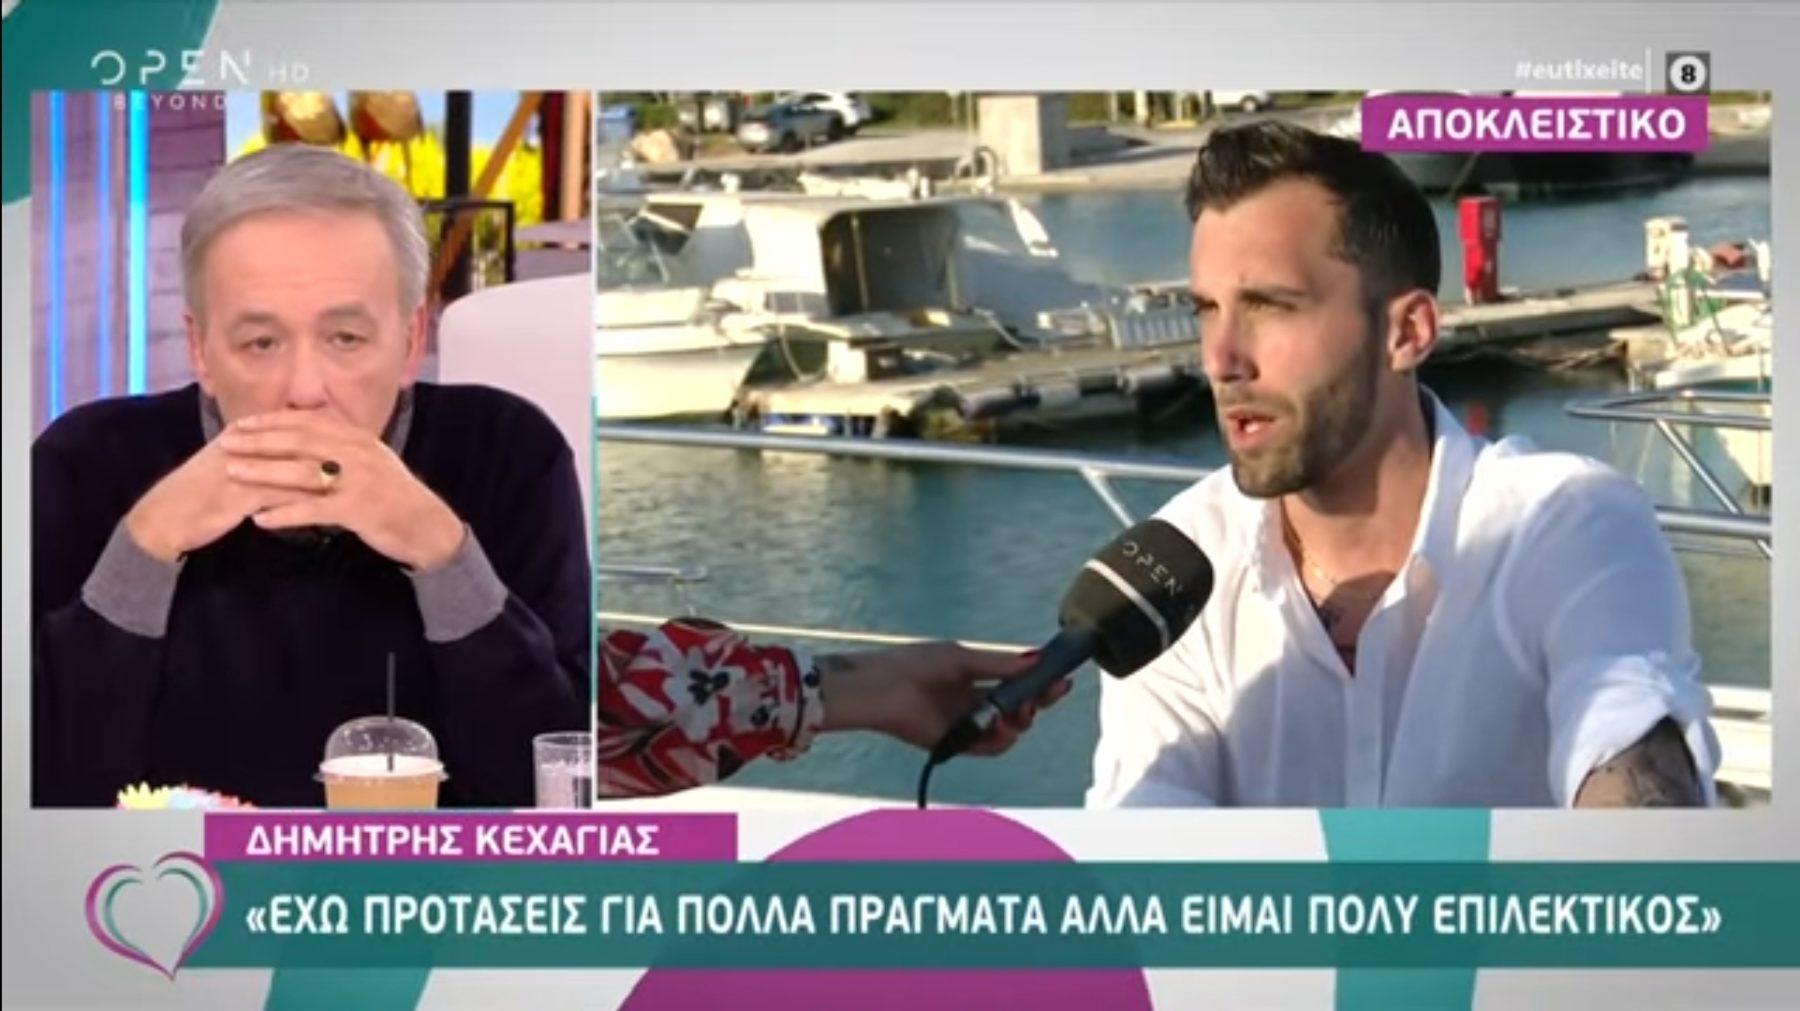 Big Brother 1: Ο Δημήτρης Κεχαγιάς εξέφρασε ανοιχτά το παράπονο του για τον Ανδρέα Μικρούτσικο